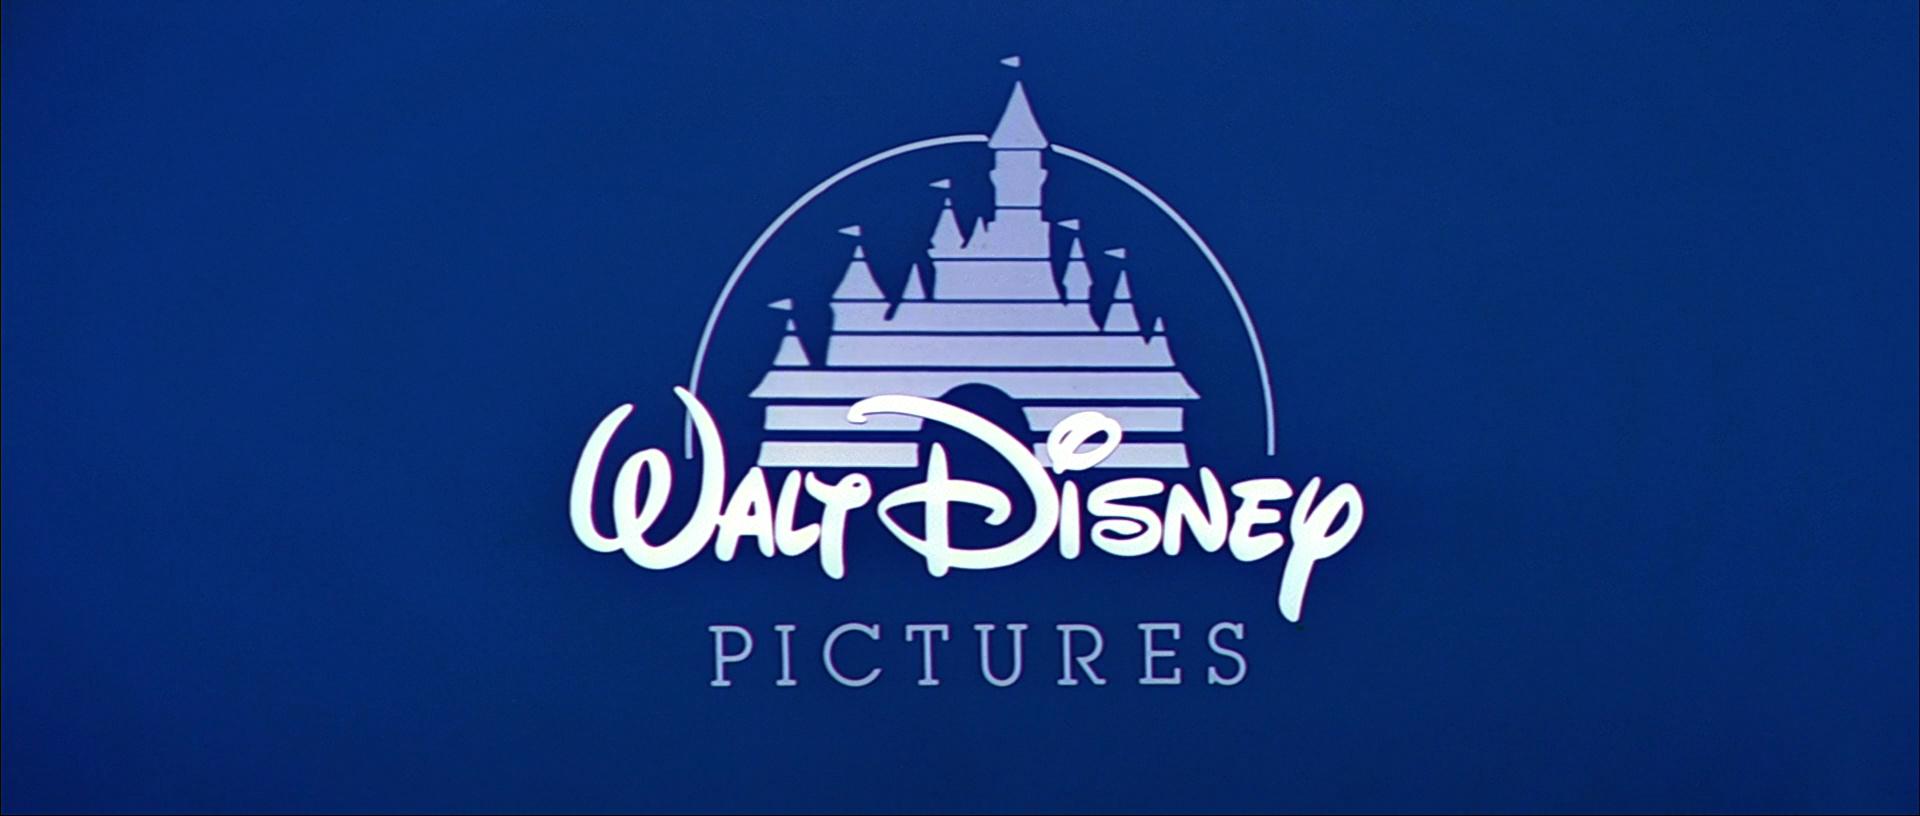 Walt Disney Pictures/Closing Variants | Logopedia | FANDOM powered ...